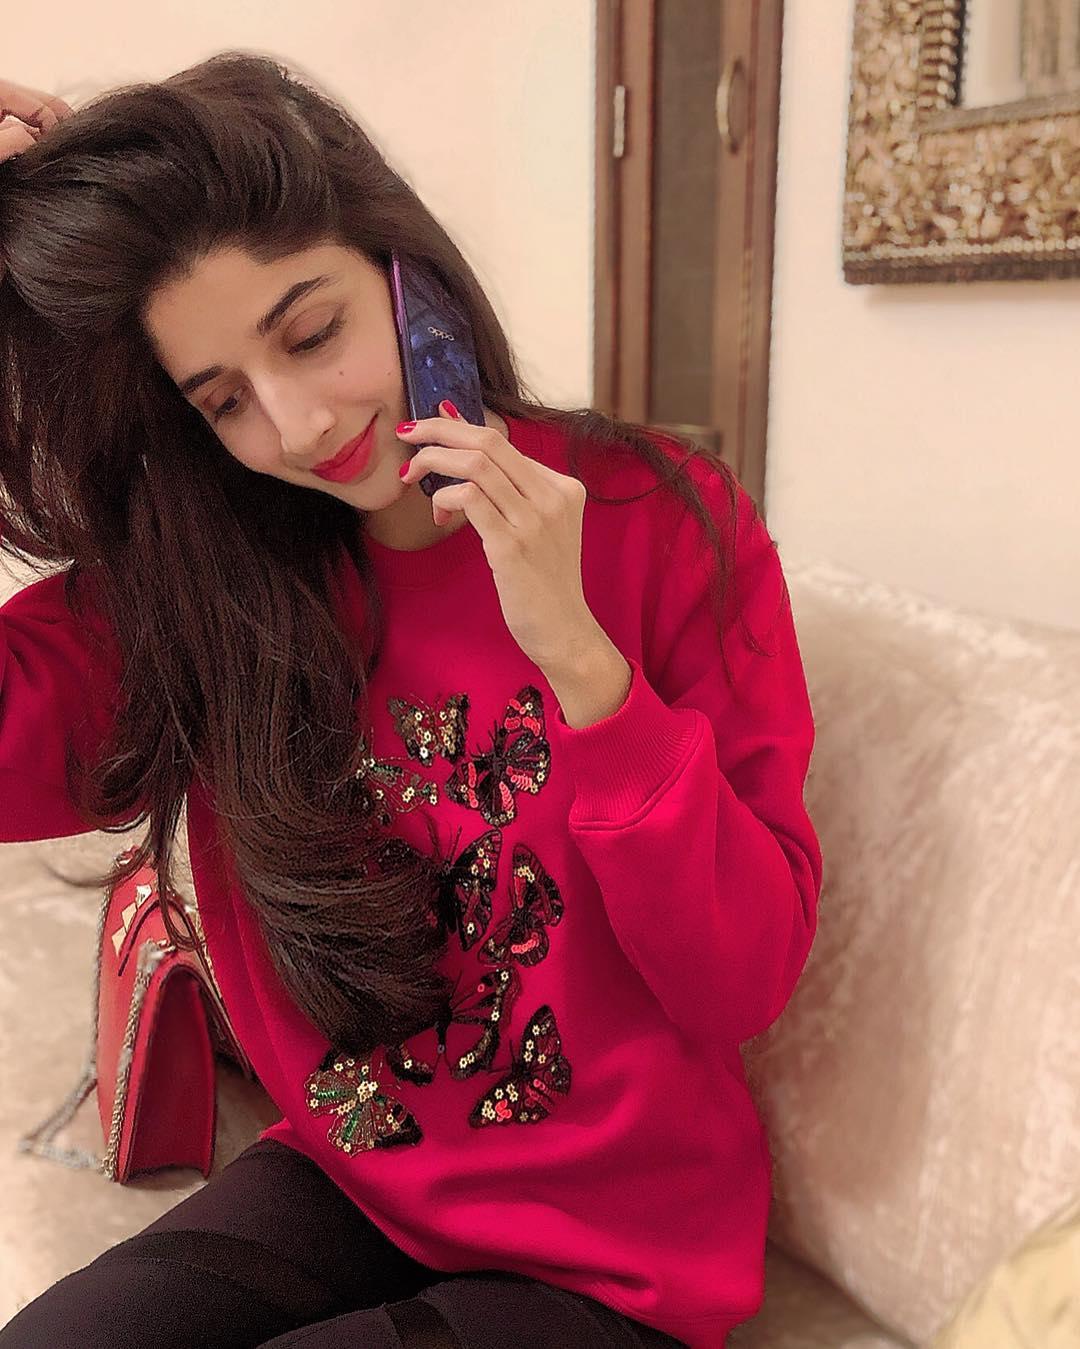 New Awesome Photos of Actress Mawra Hocane